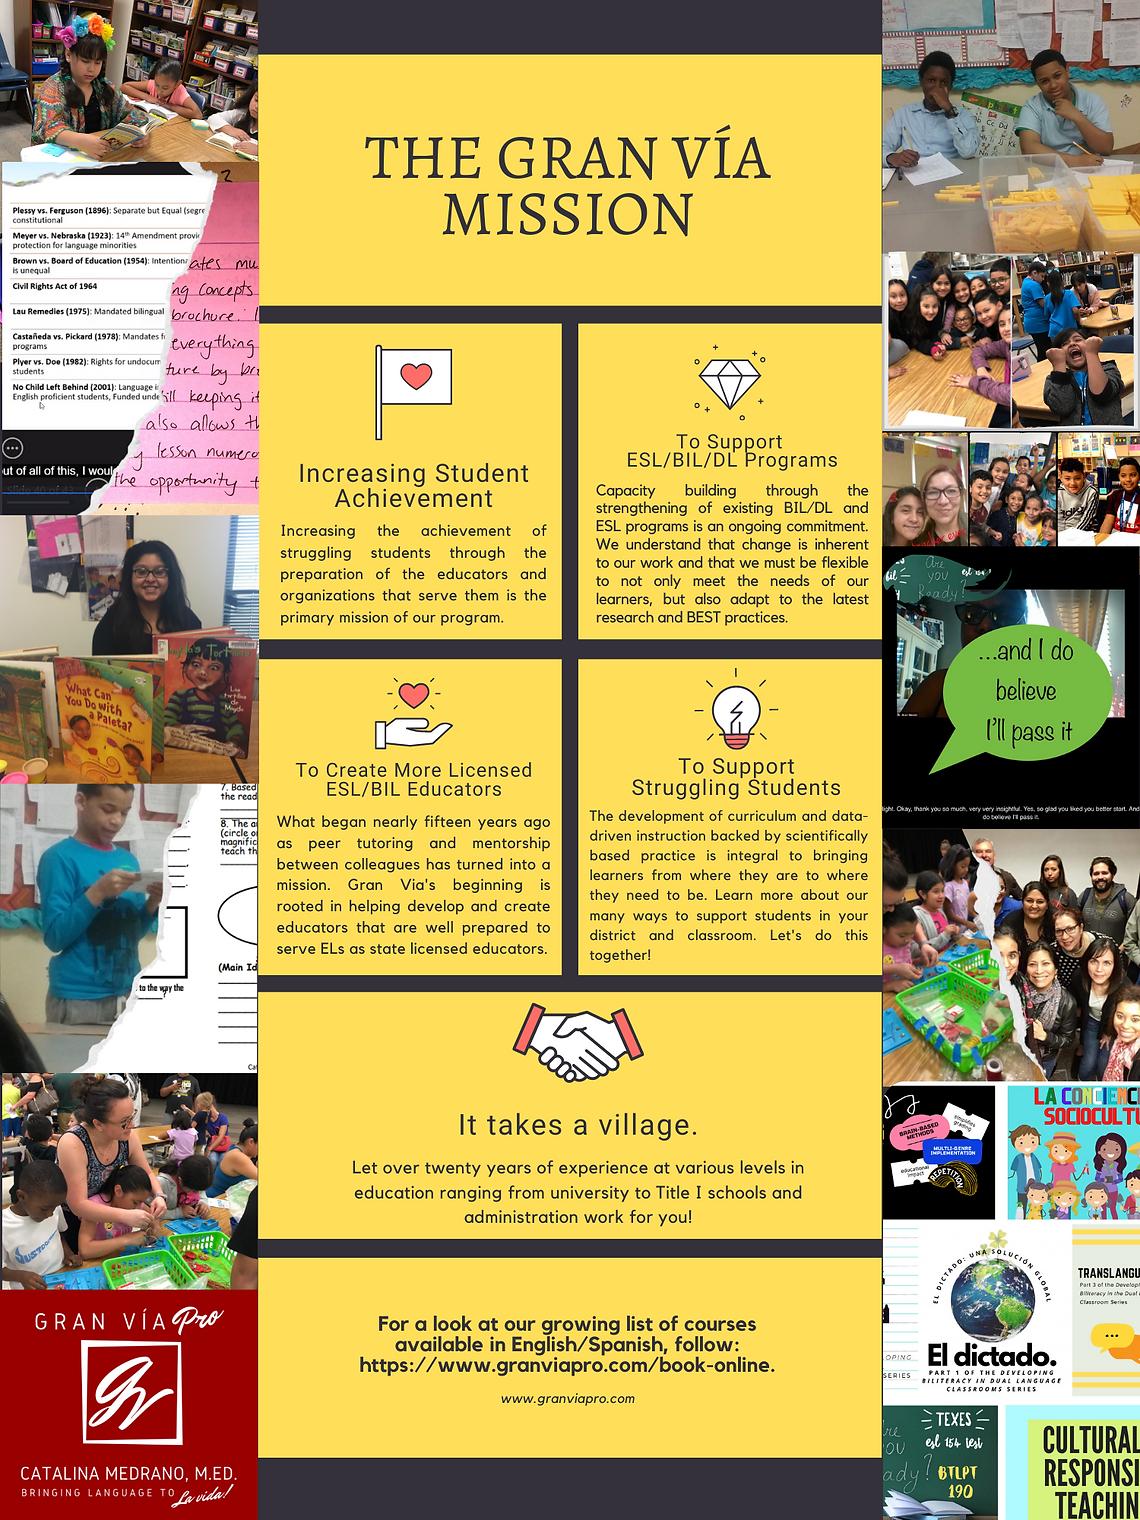 Copy of Gran Via Mission (6).png